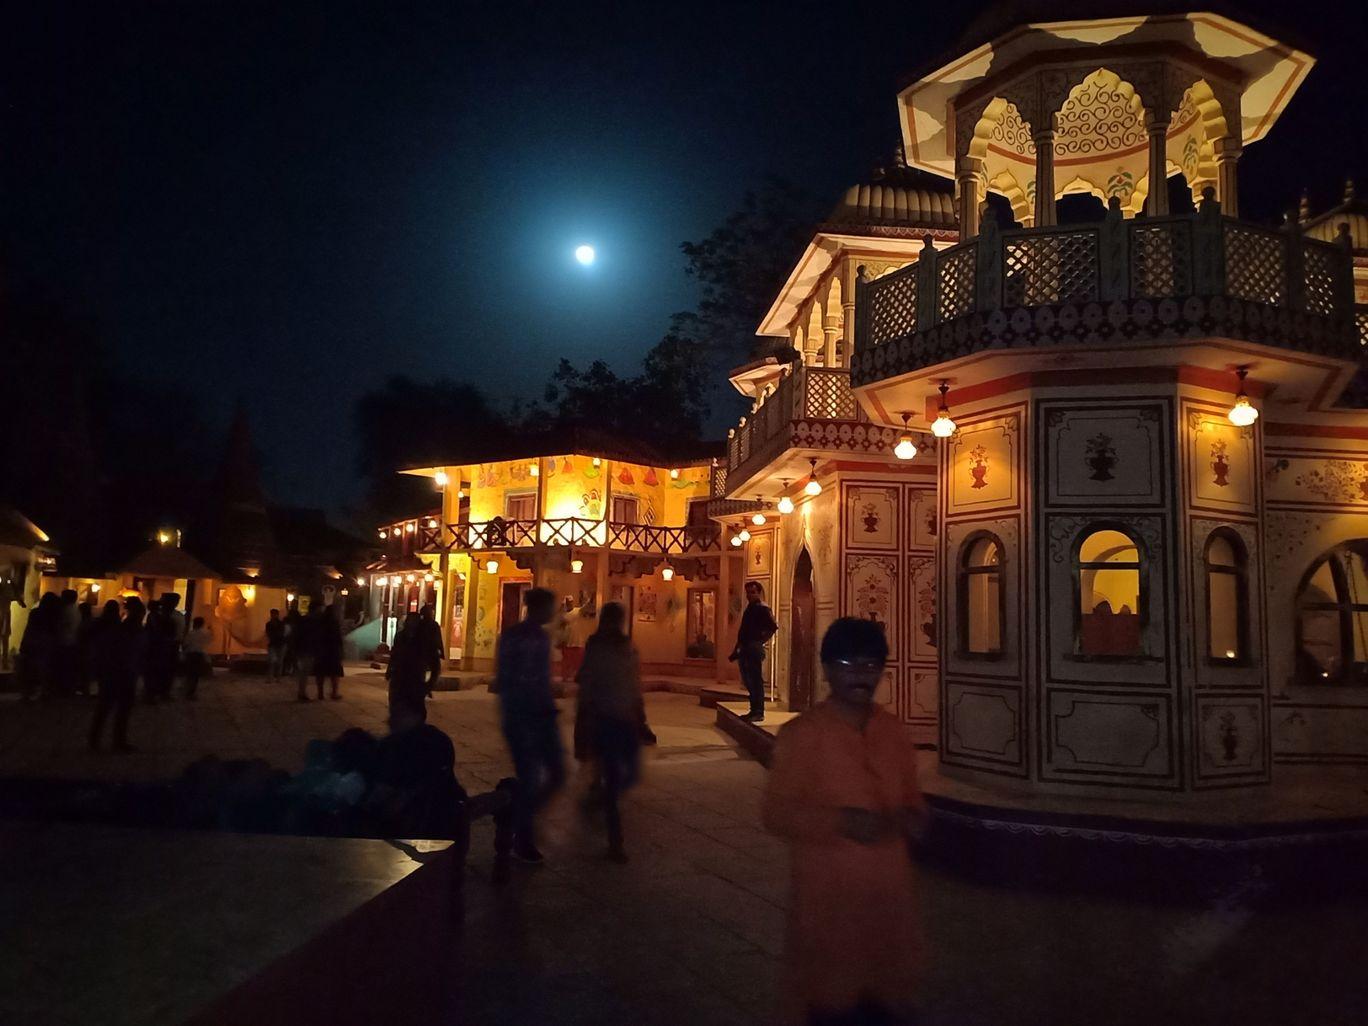 Photo of Jaipur By sovan dey